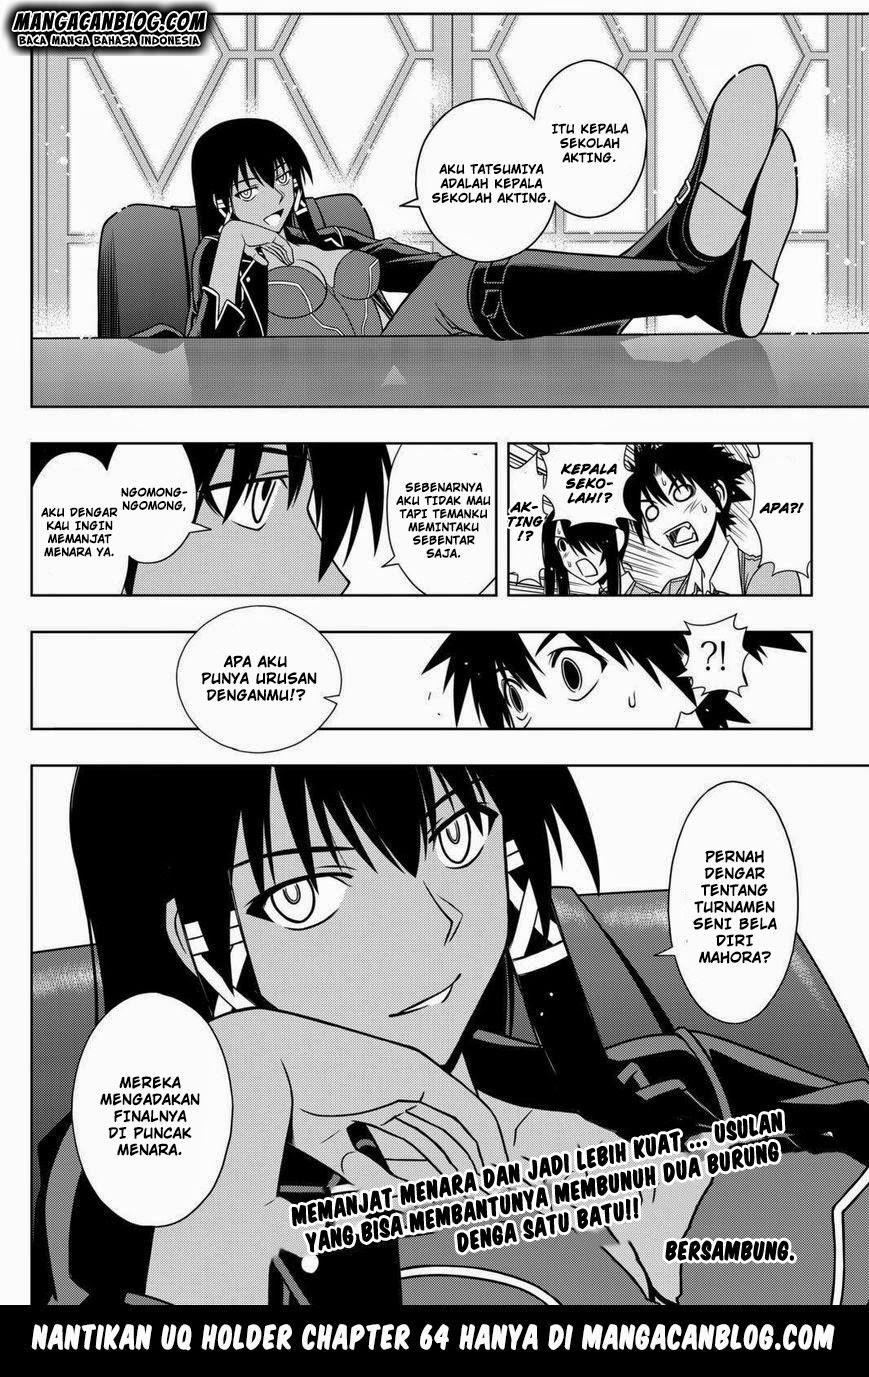 Komik uq holder 063 - perempuan kuat yang lucu 64 Indonesia uq holder 063 - perempuan kuat yang lucu Terbaru 16|Baca Manga Komik Indonesia